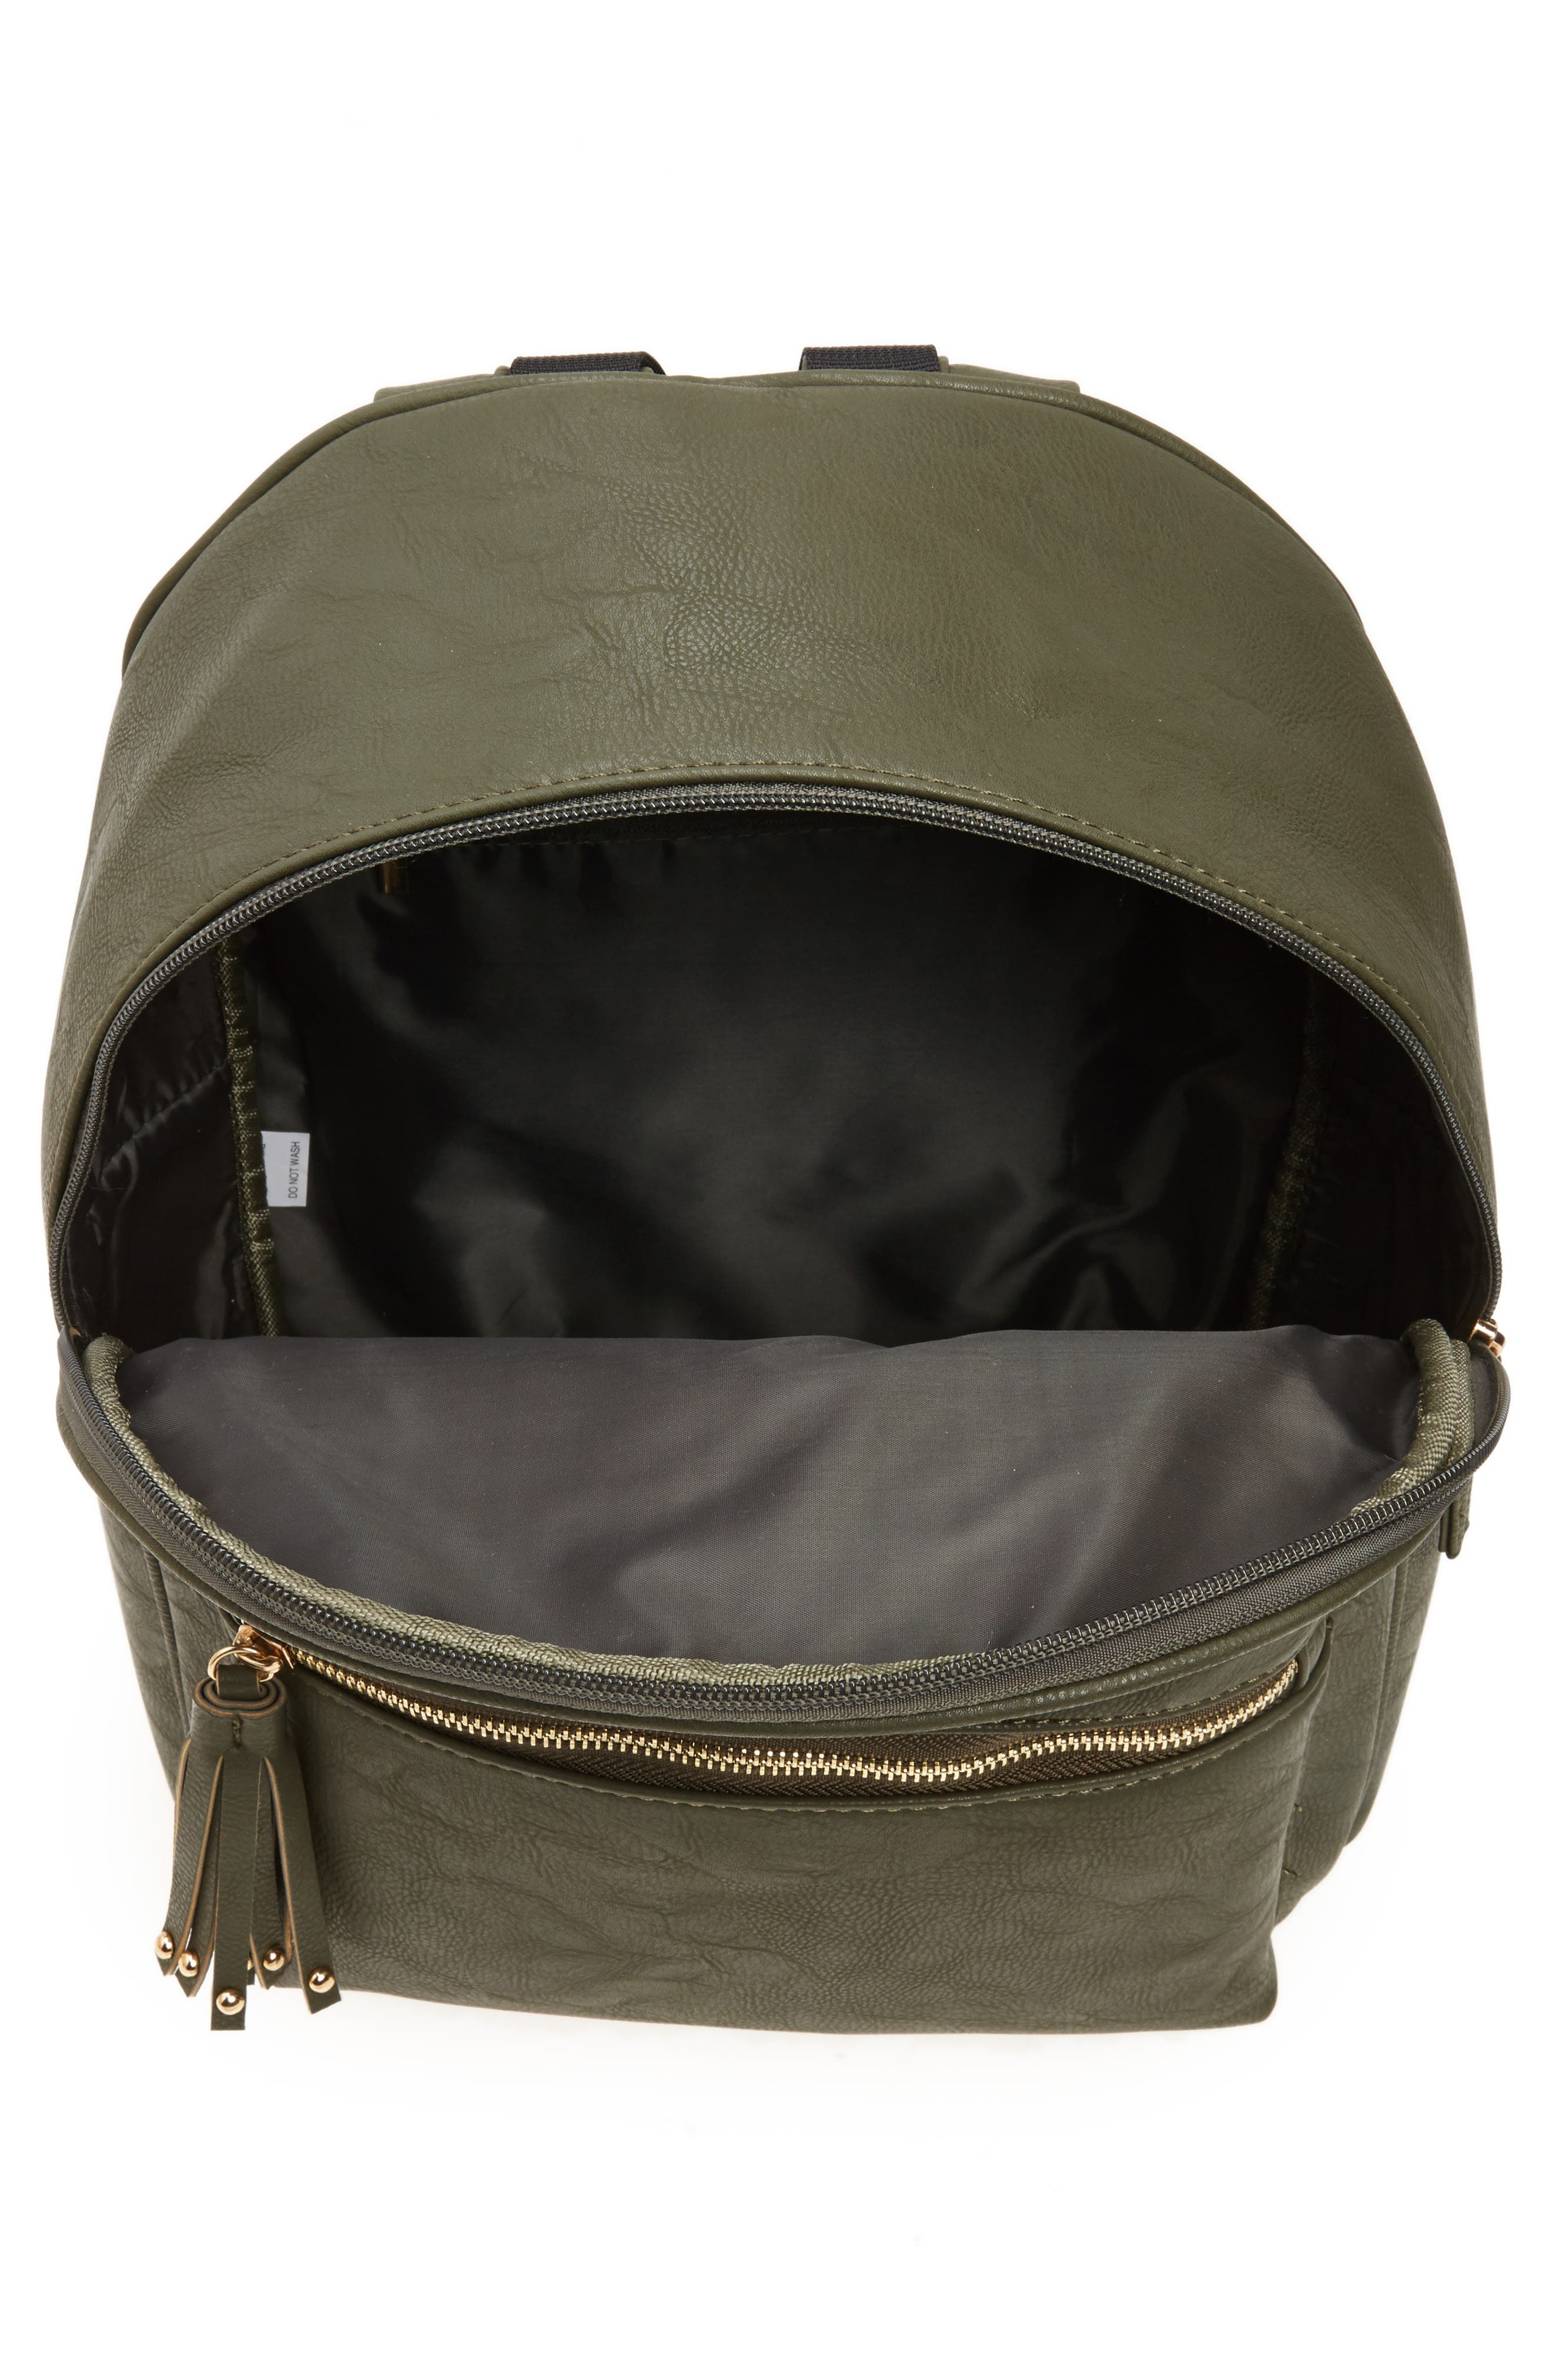 Sequin Rose Appliqué Faux Leather Backpack,                             Alternate thumbnail 4, color,                             Olive